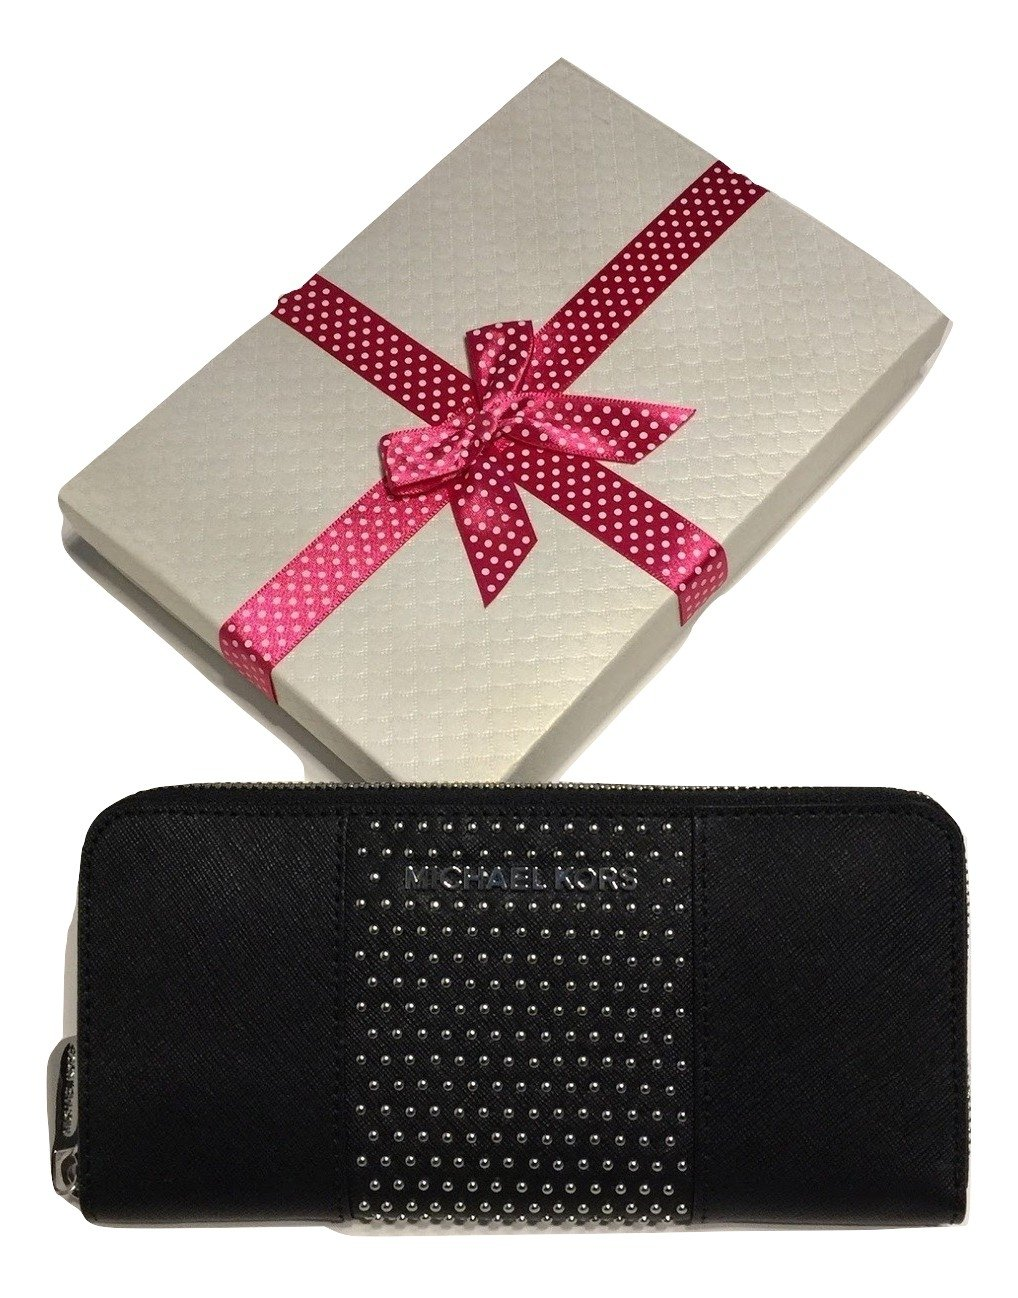 Michael Kors Jet Set Travel ZA Continental Micro Stud Wallet (Black)